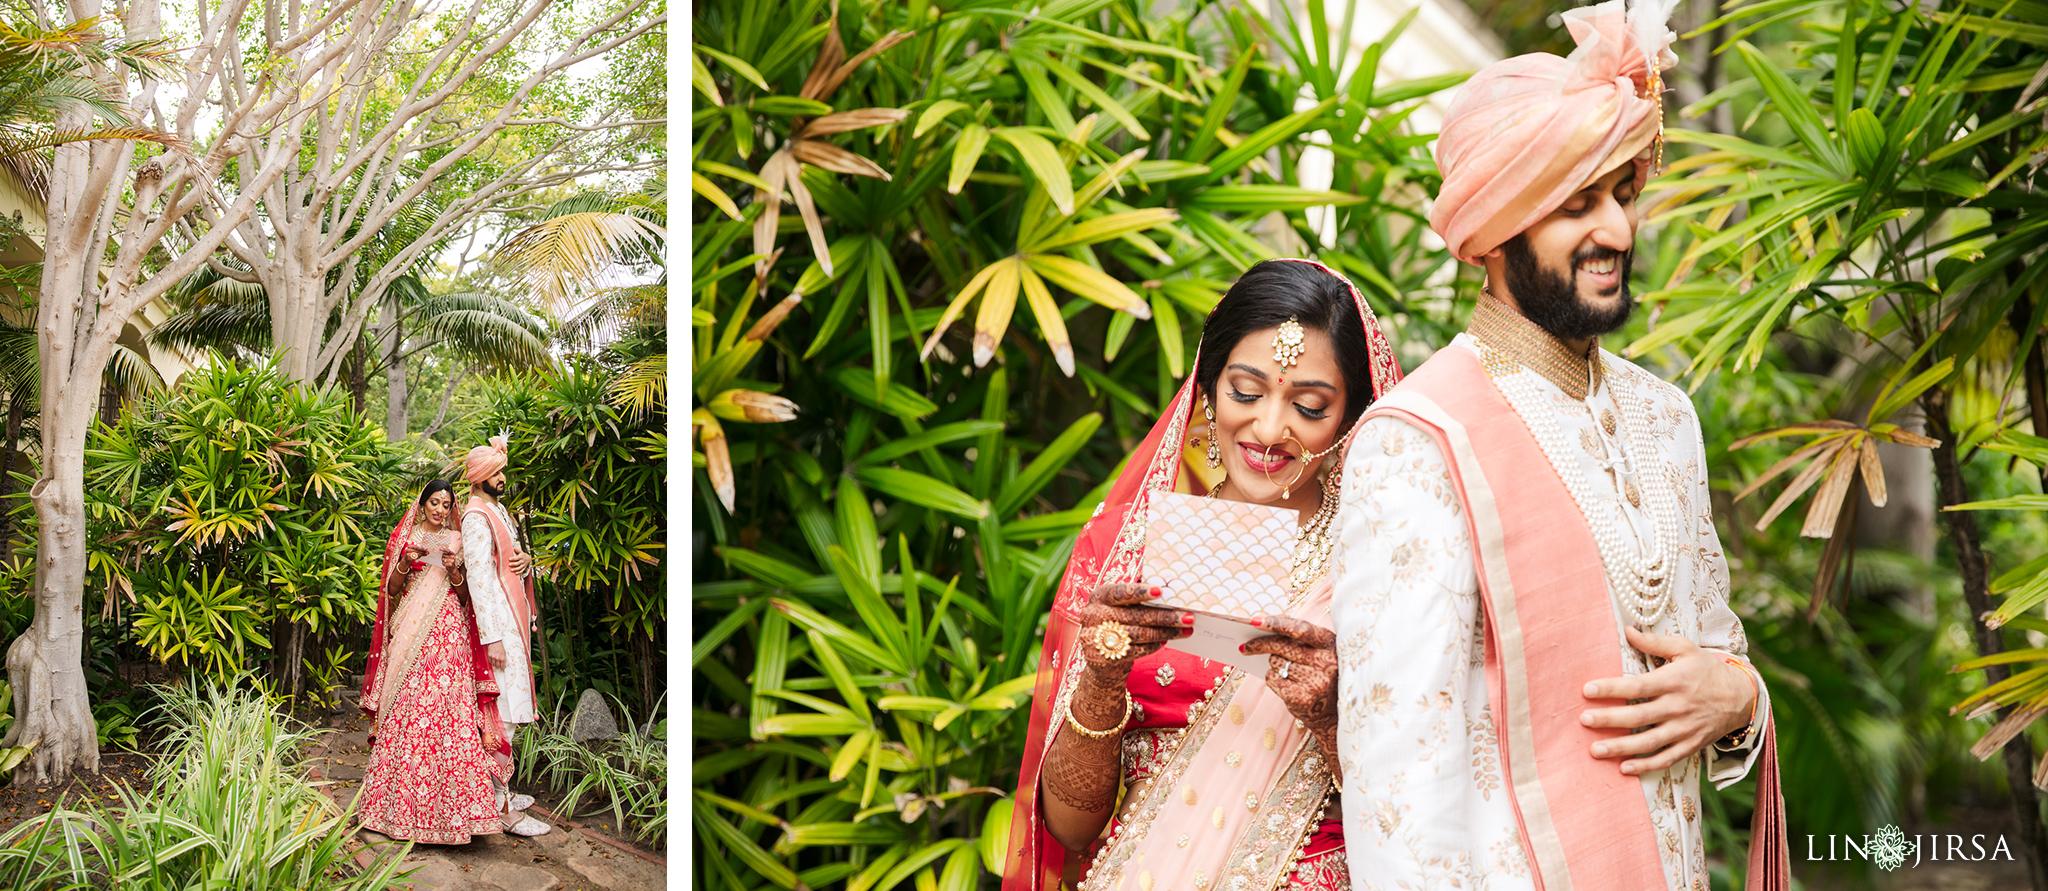 13 Ritz Carlton Laguna Niguel Indian Wedding Photography